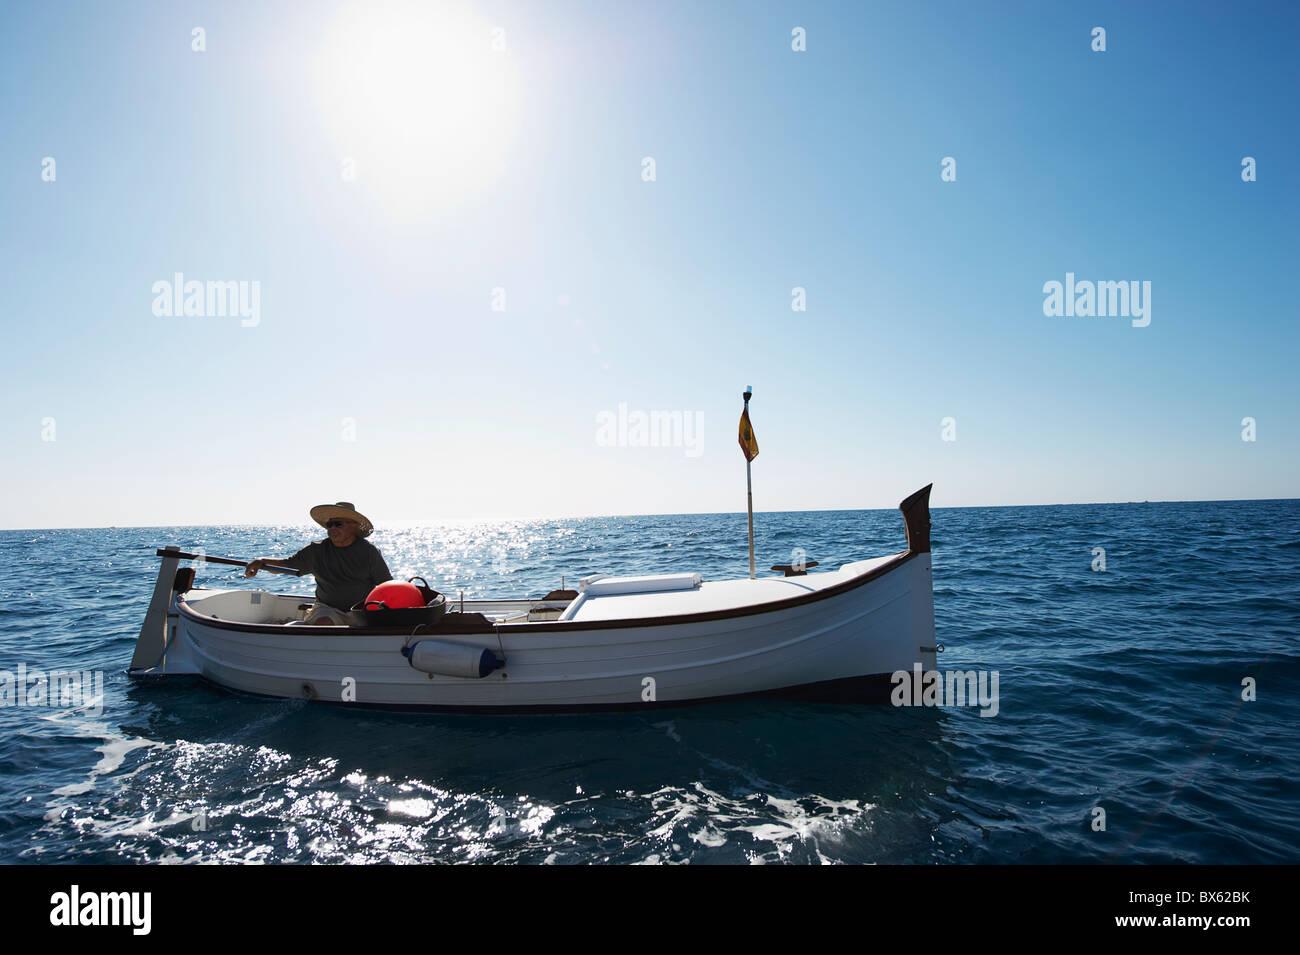 Fisherman on fishing boat at sea - Stock Image